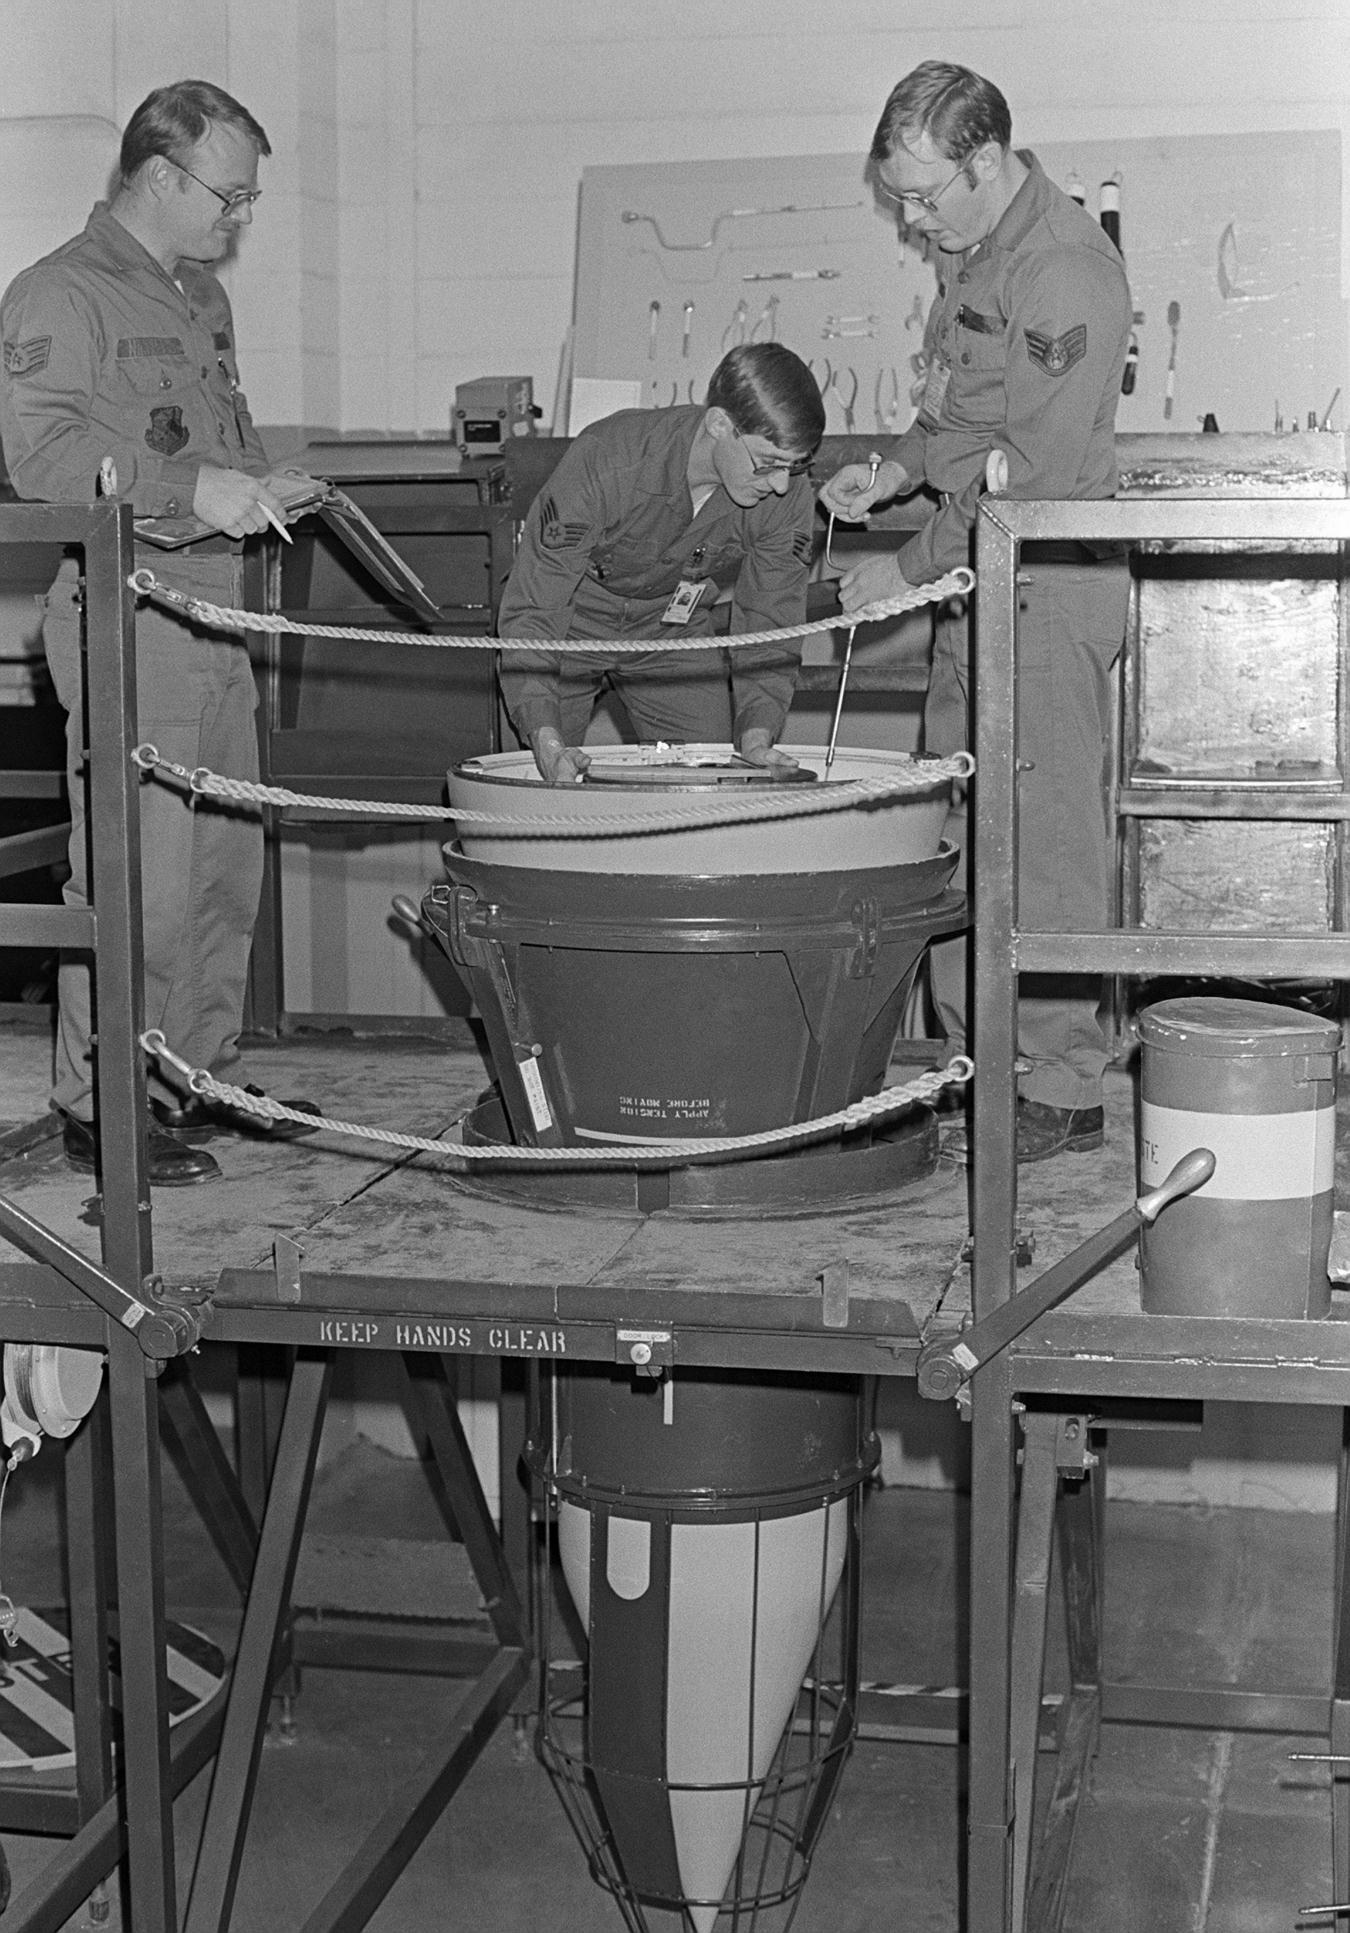 Minuteman Missile Nuclear Warheads